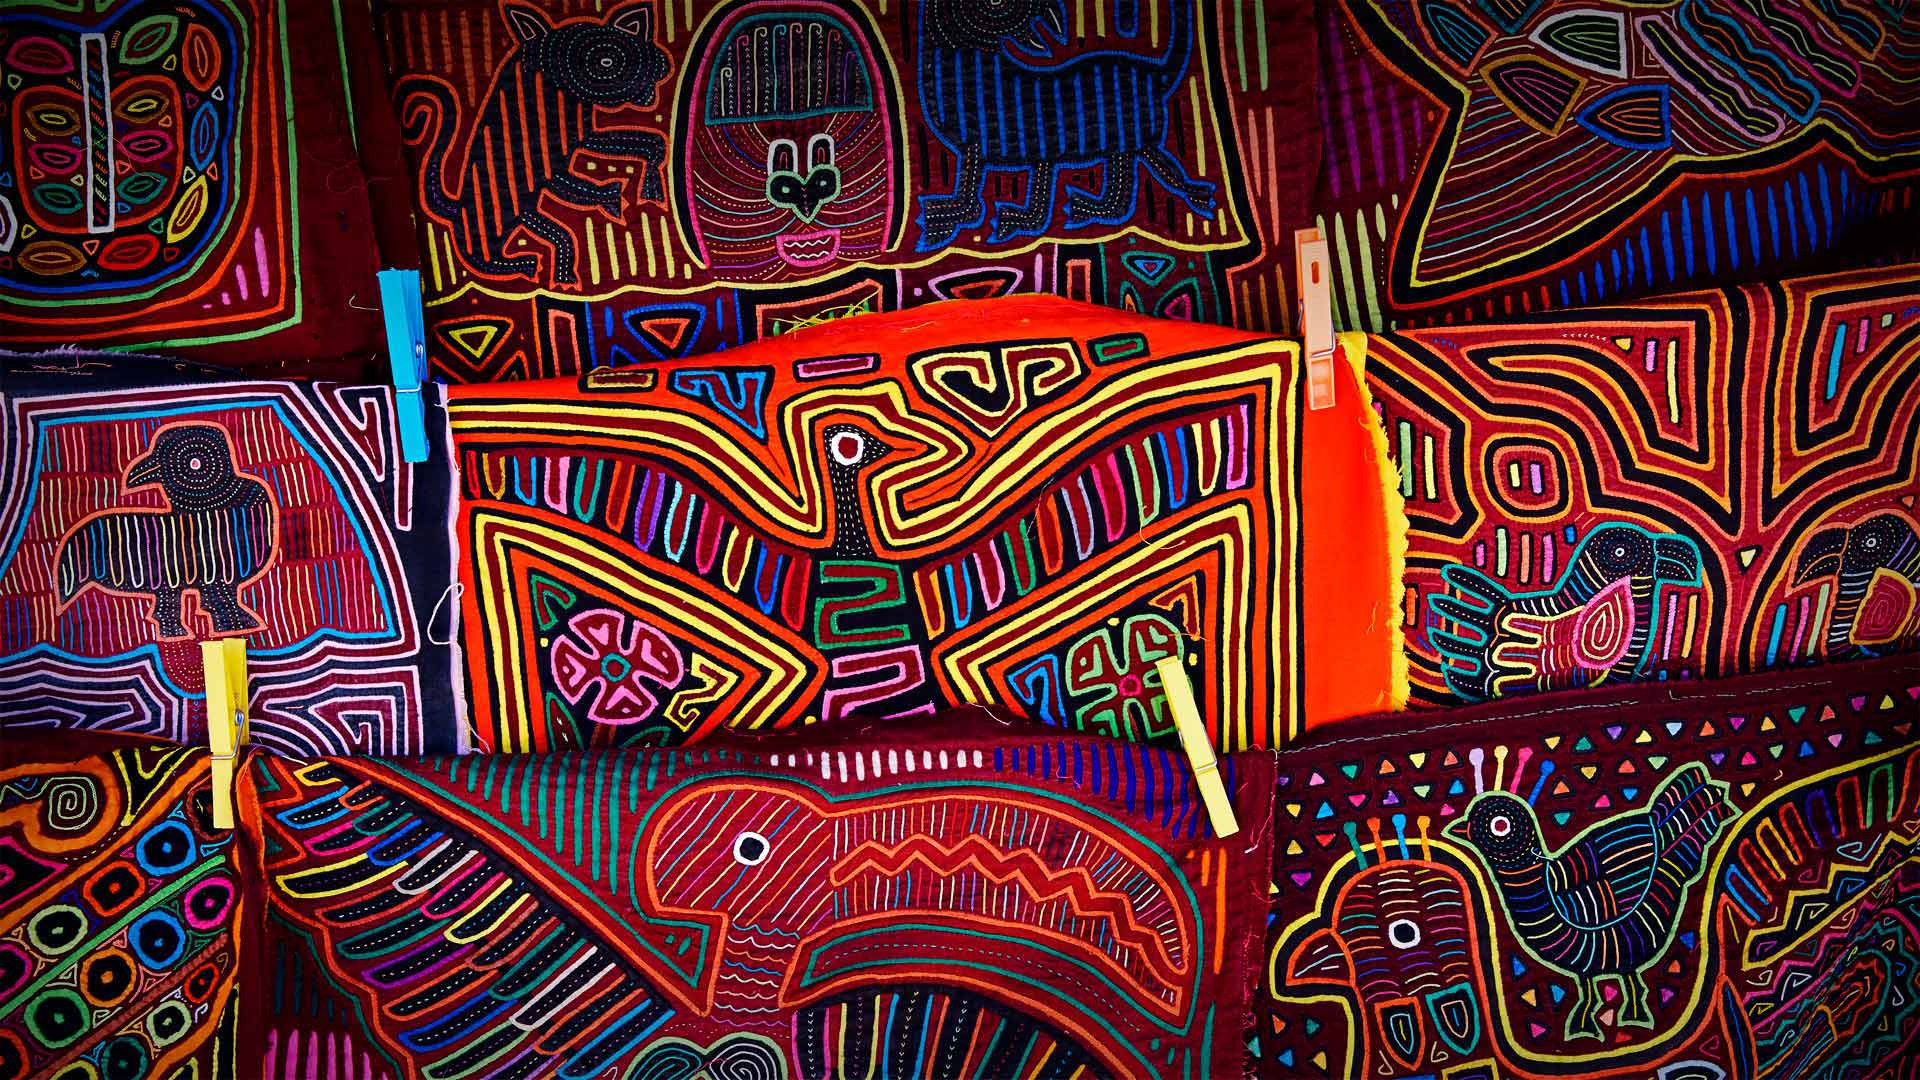 Handicrafts of the Guna people of the Guna Yala archipelago, Panama (© Lars Schneider/Tandem Stills + Motion)(Bing United States)